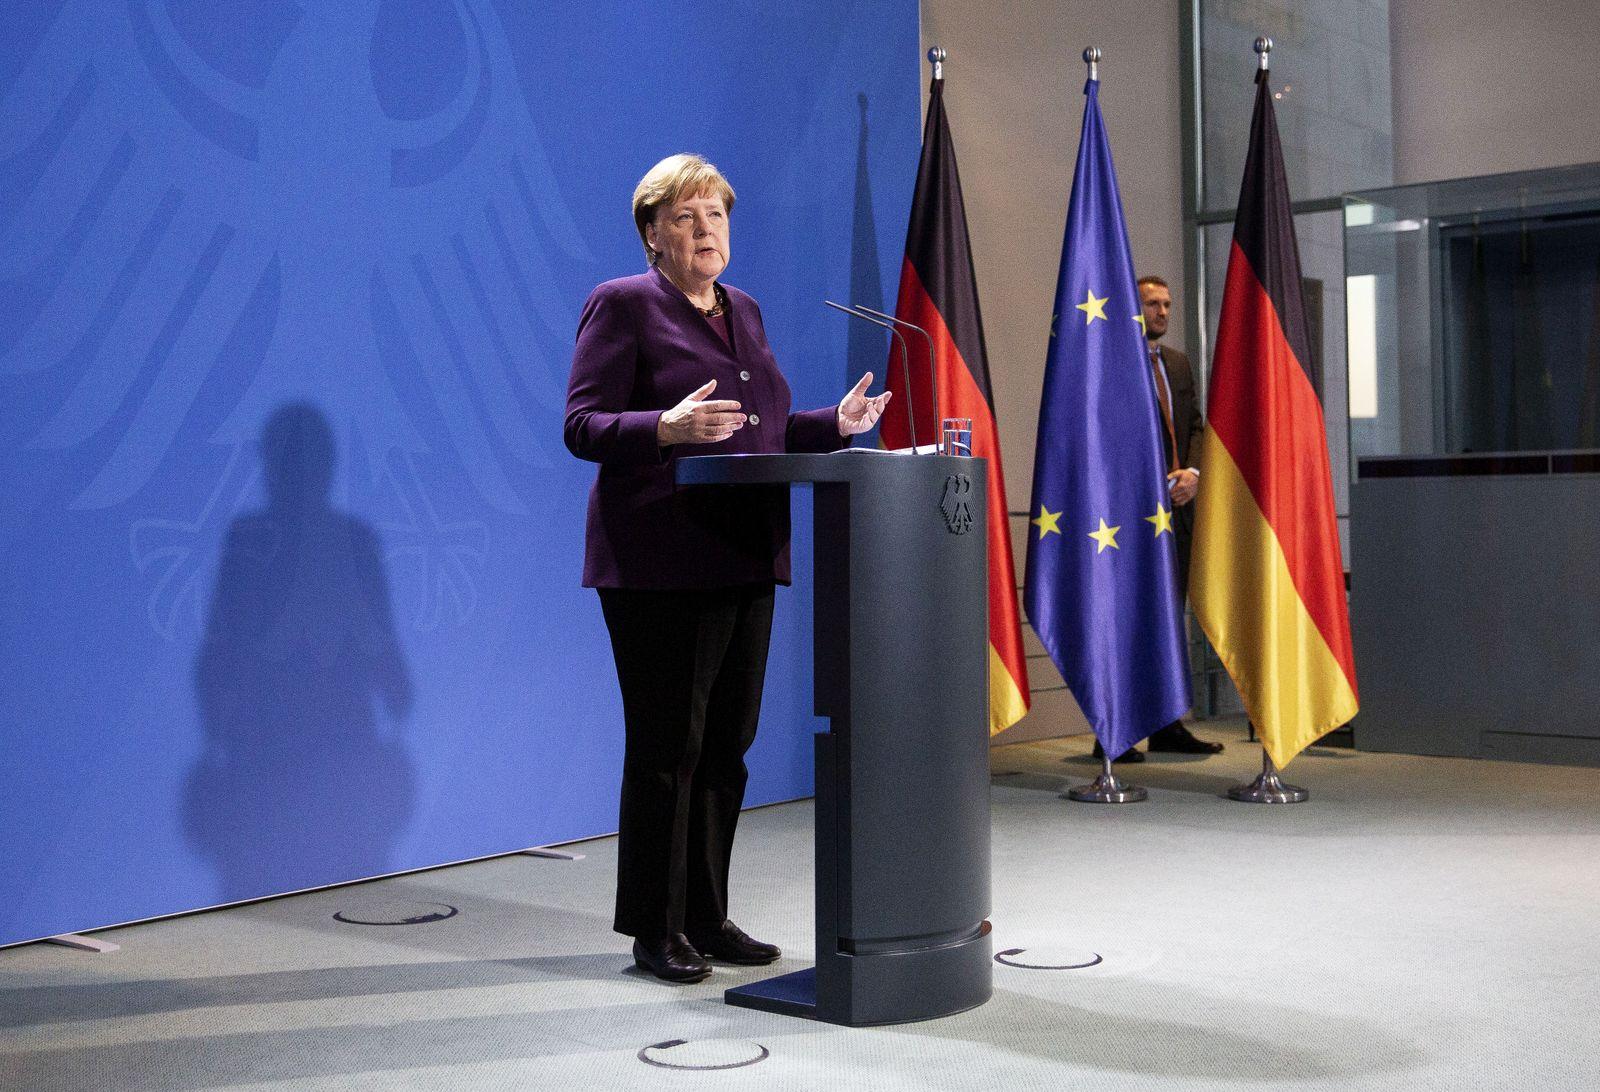 Merkel Holds Press Conference As Authorities Tighten Measures To Stem Coronavirus Spread